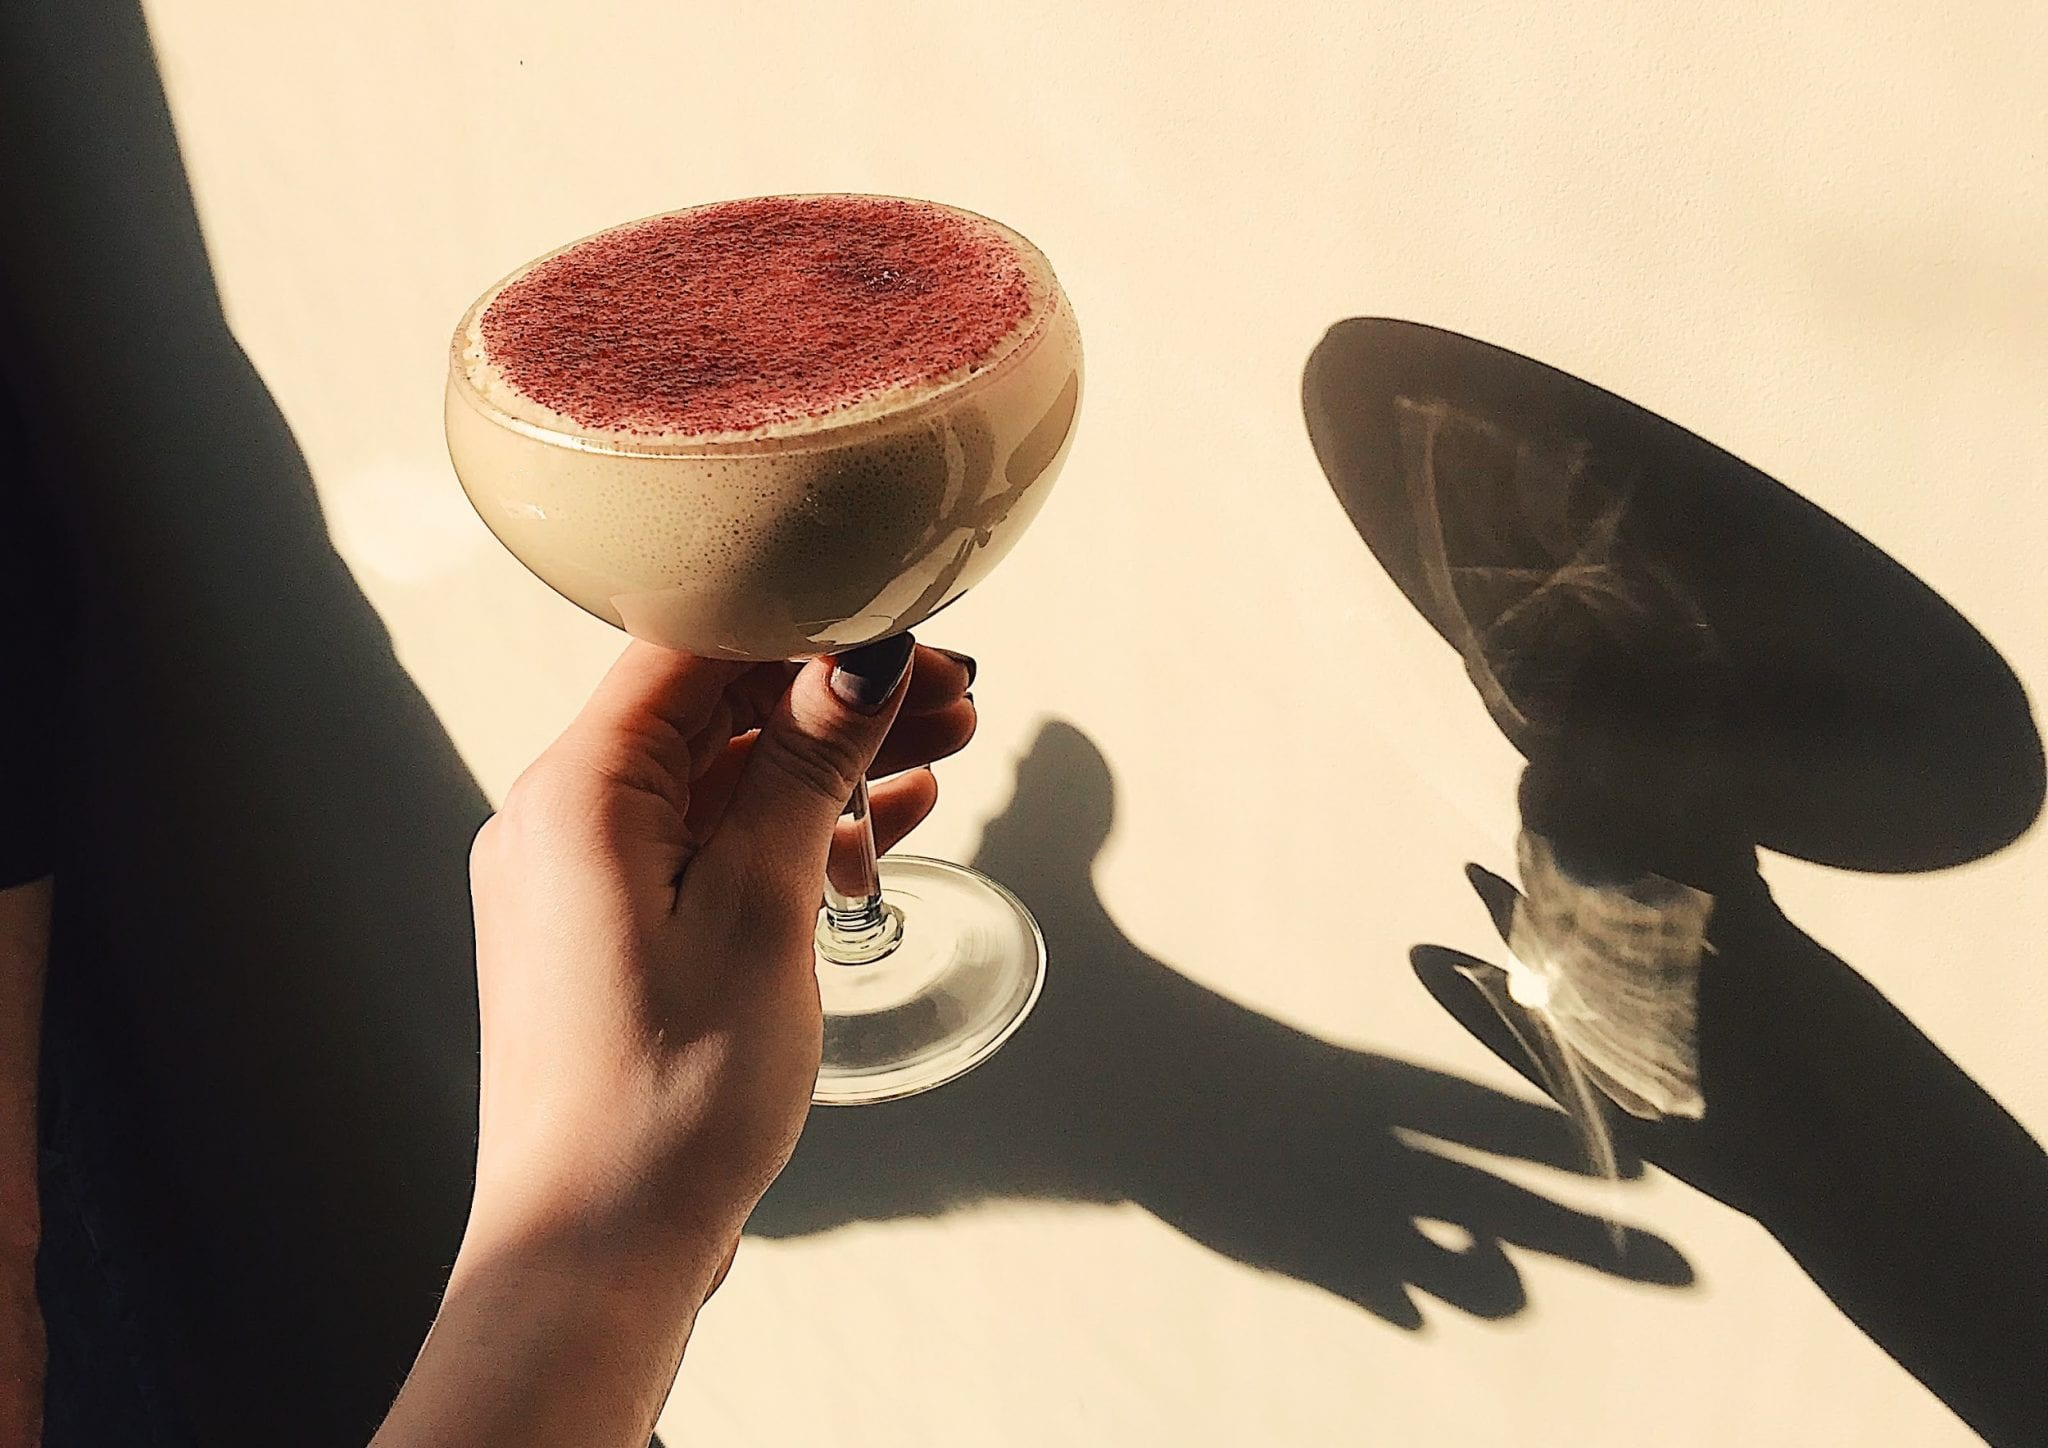 an alternative coffee beverage